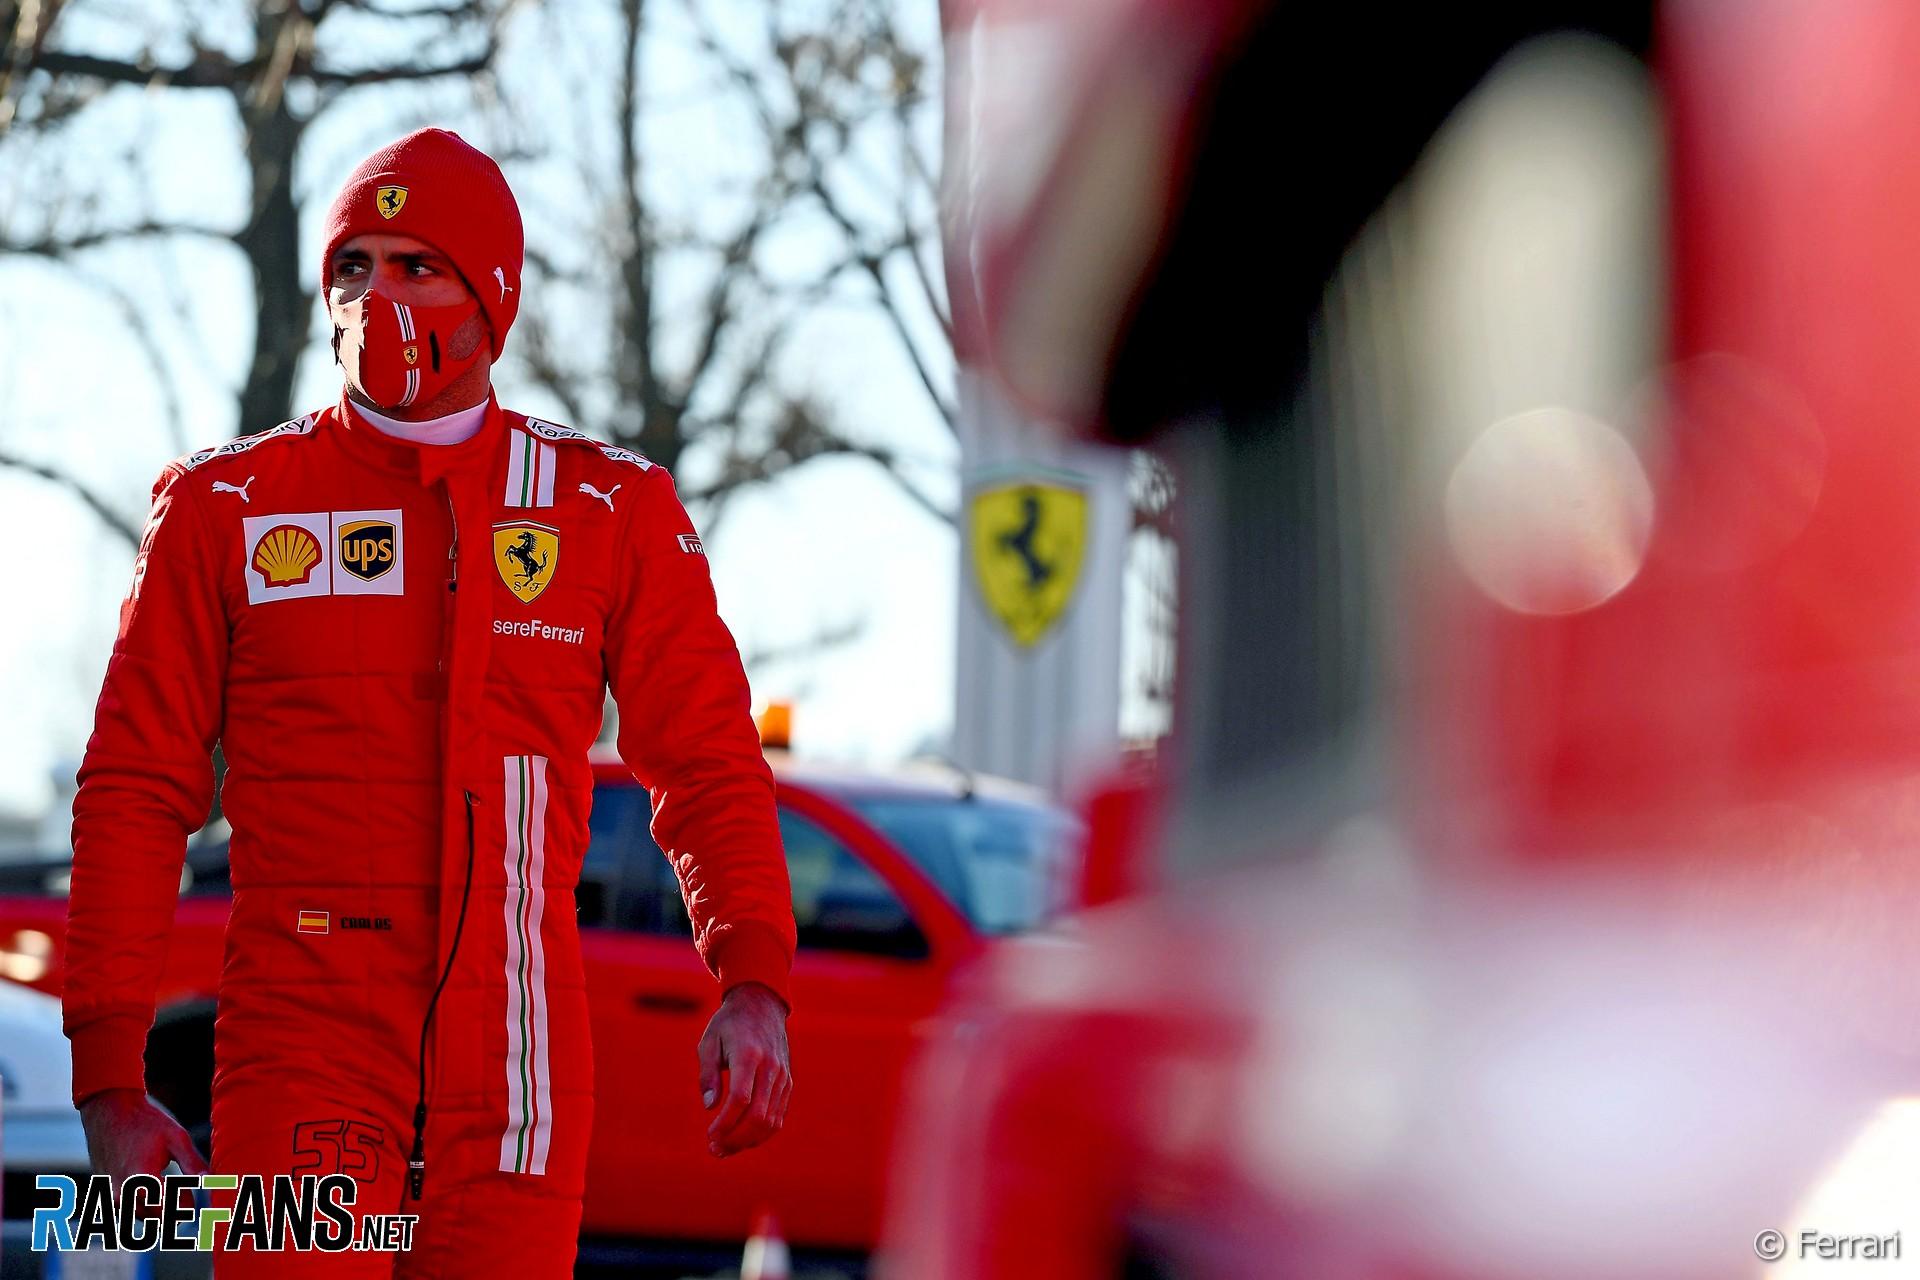 Carlos Sainz Jnr, Ferrari, Fiorano, 2021